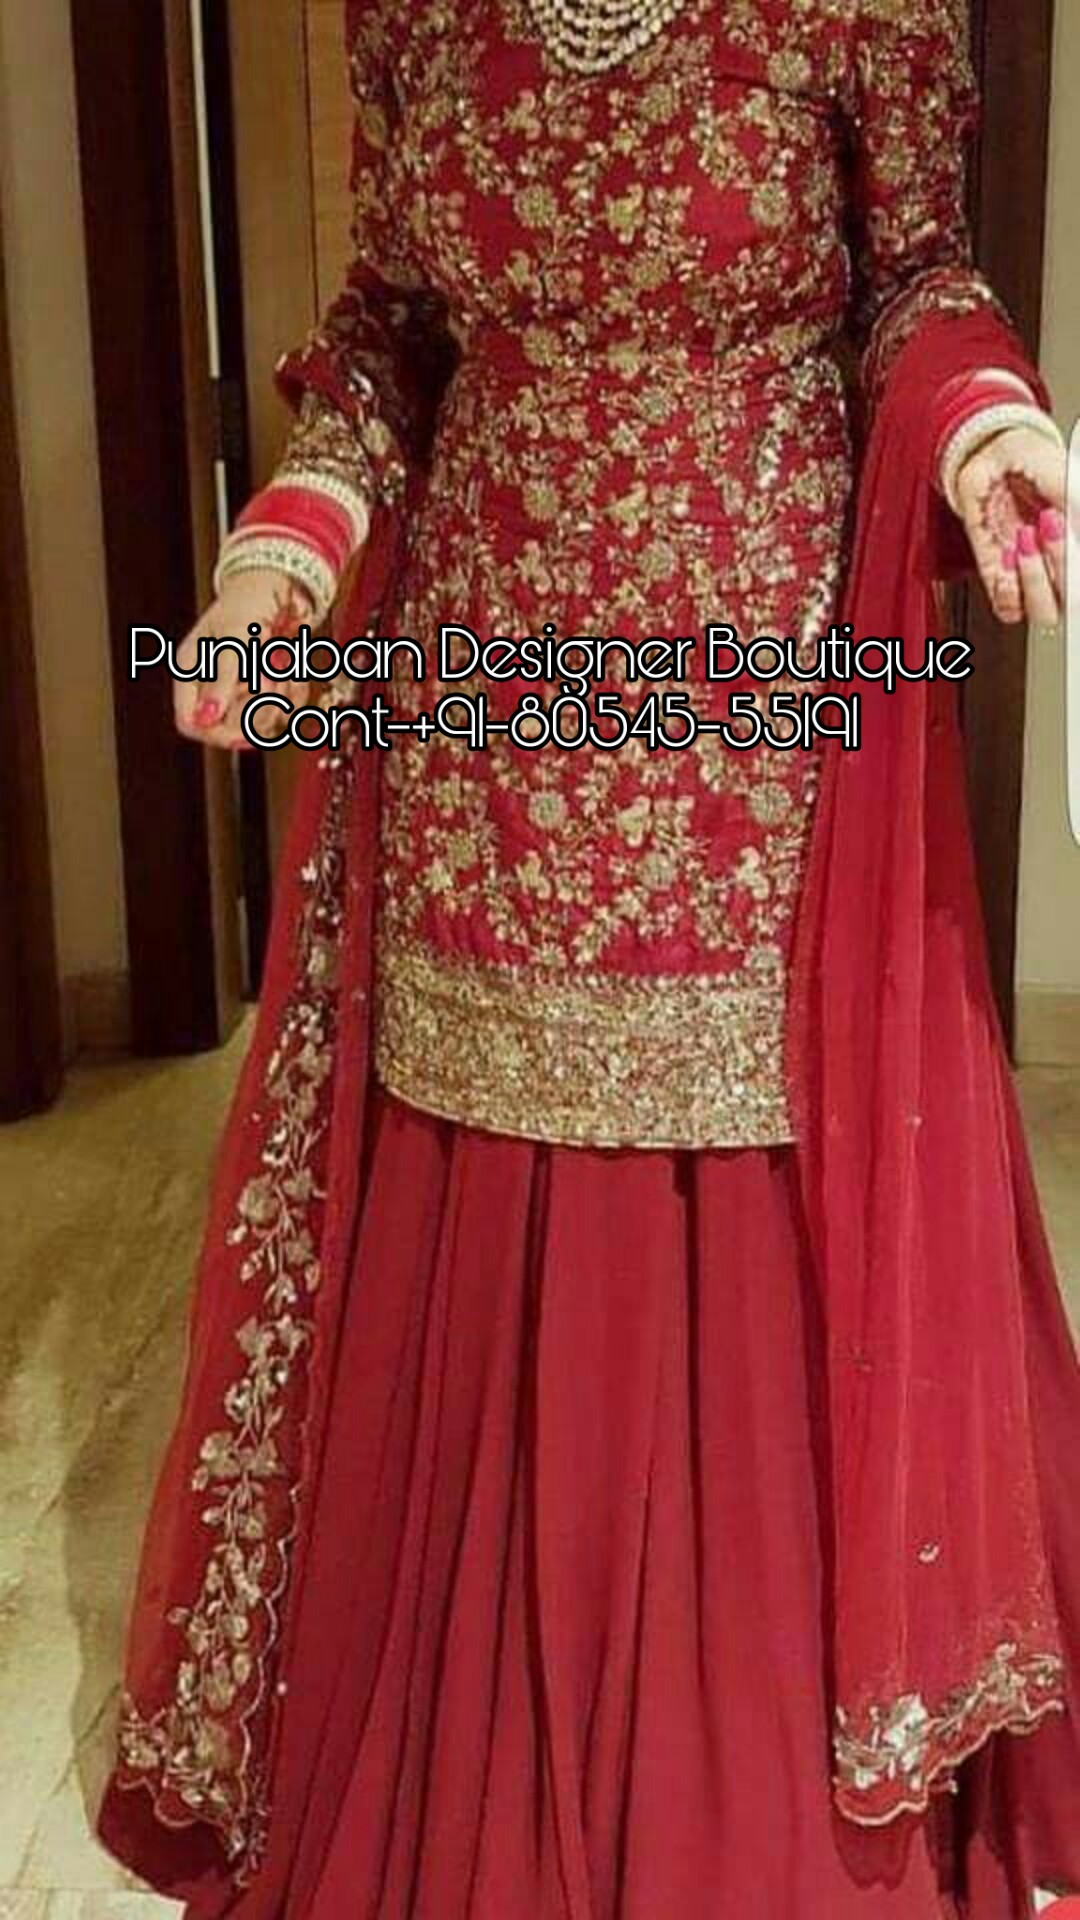 e89c6e075025 Lehenga Choli Shop Online India, Lehenga Online Shopping Chennai, lehenga  sale online shopping,